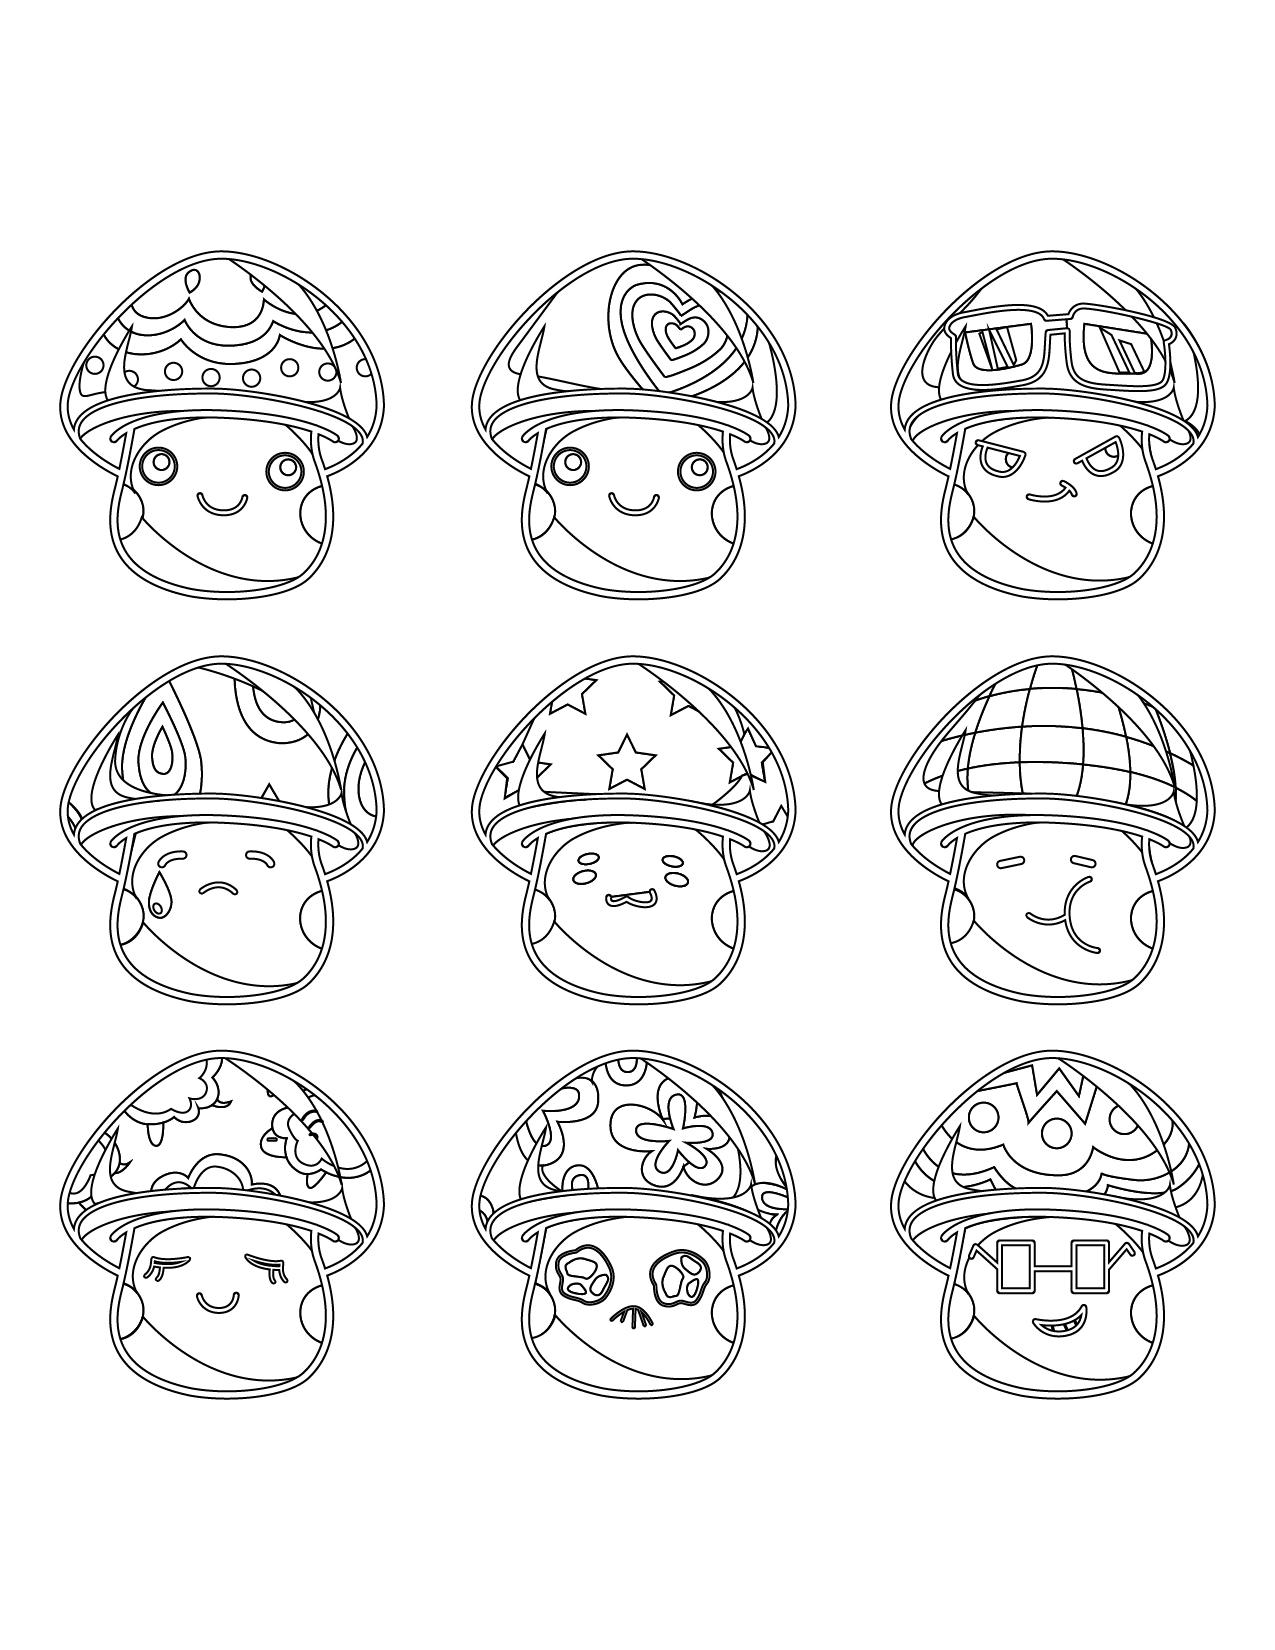 Coloriage à imprimer gratuit, champignons cartoon - Artherapie.ca